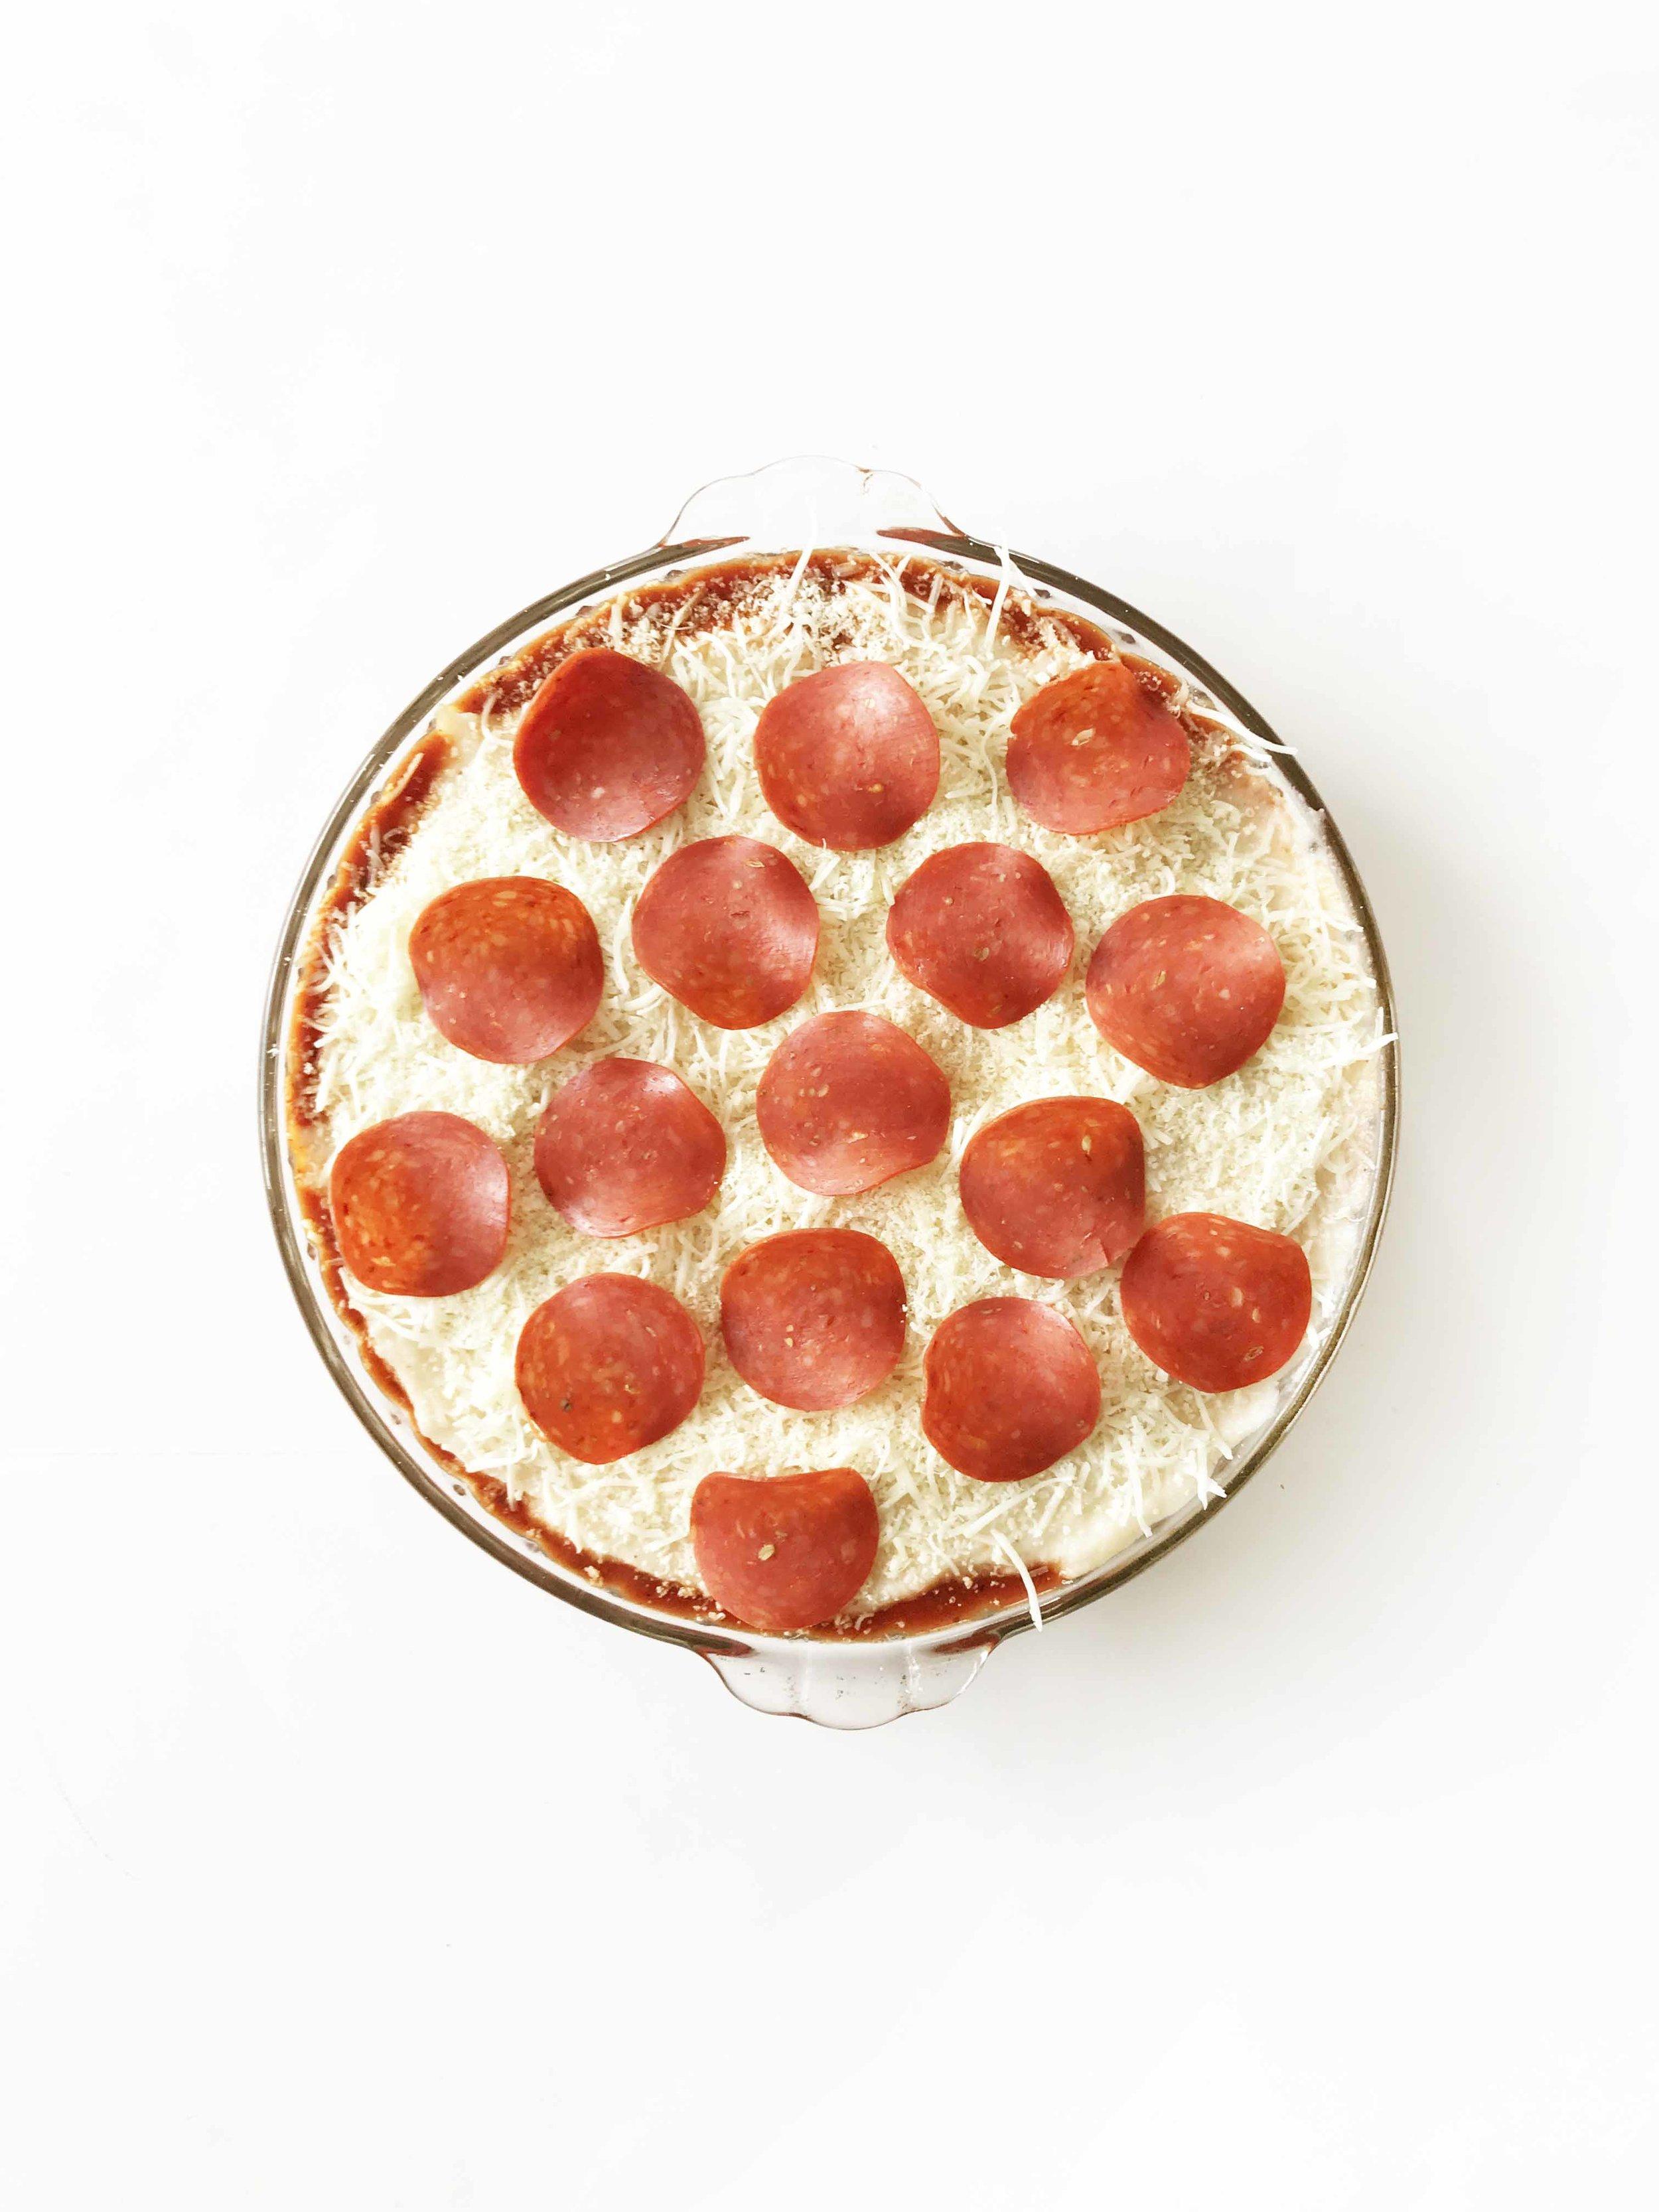 cauliflower-pizza-dip7.jpg